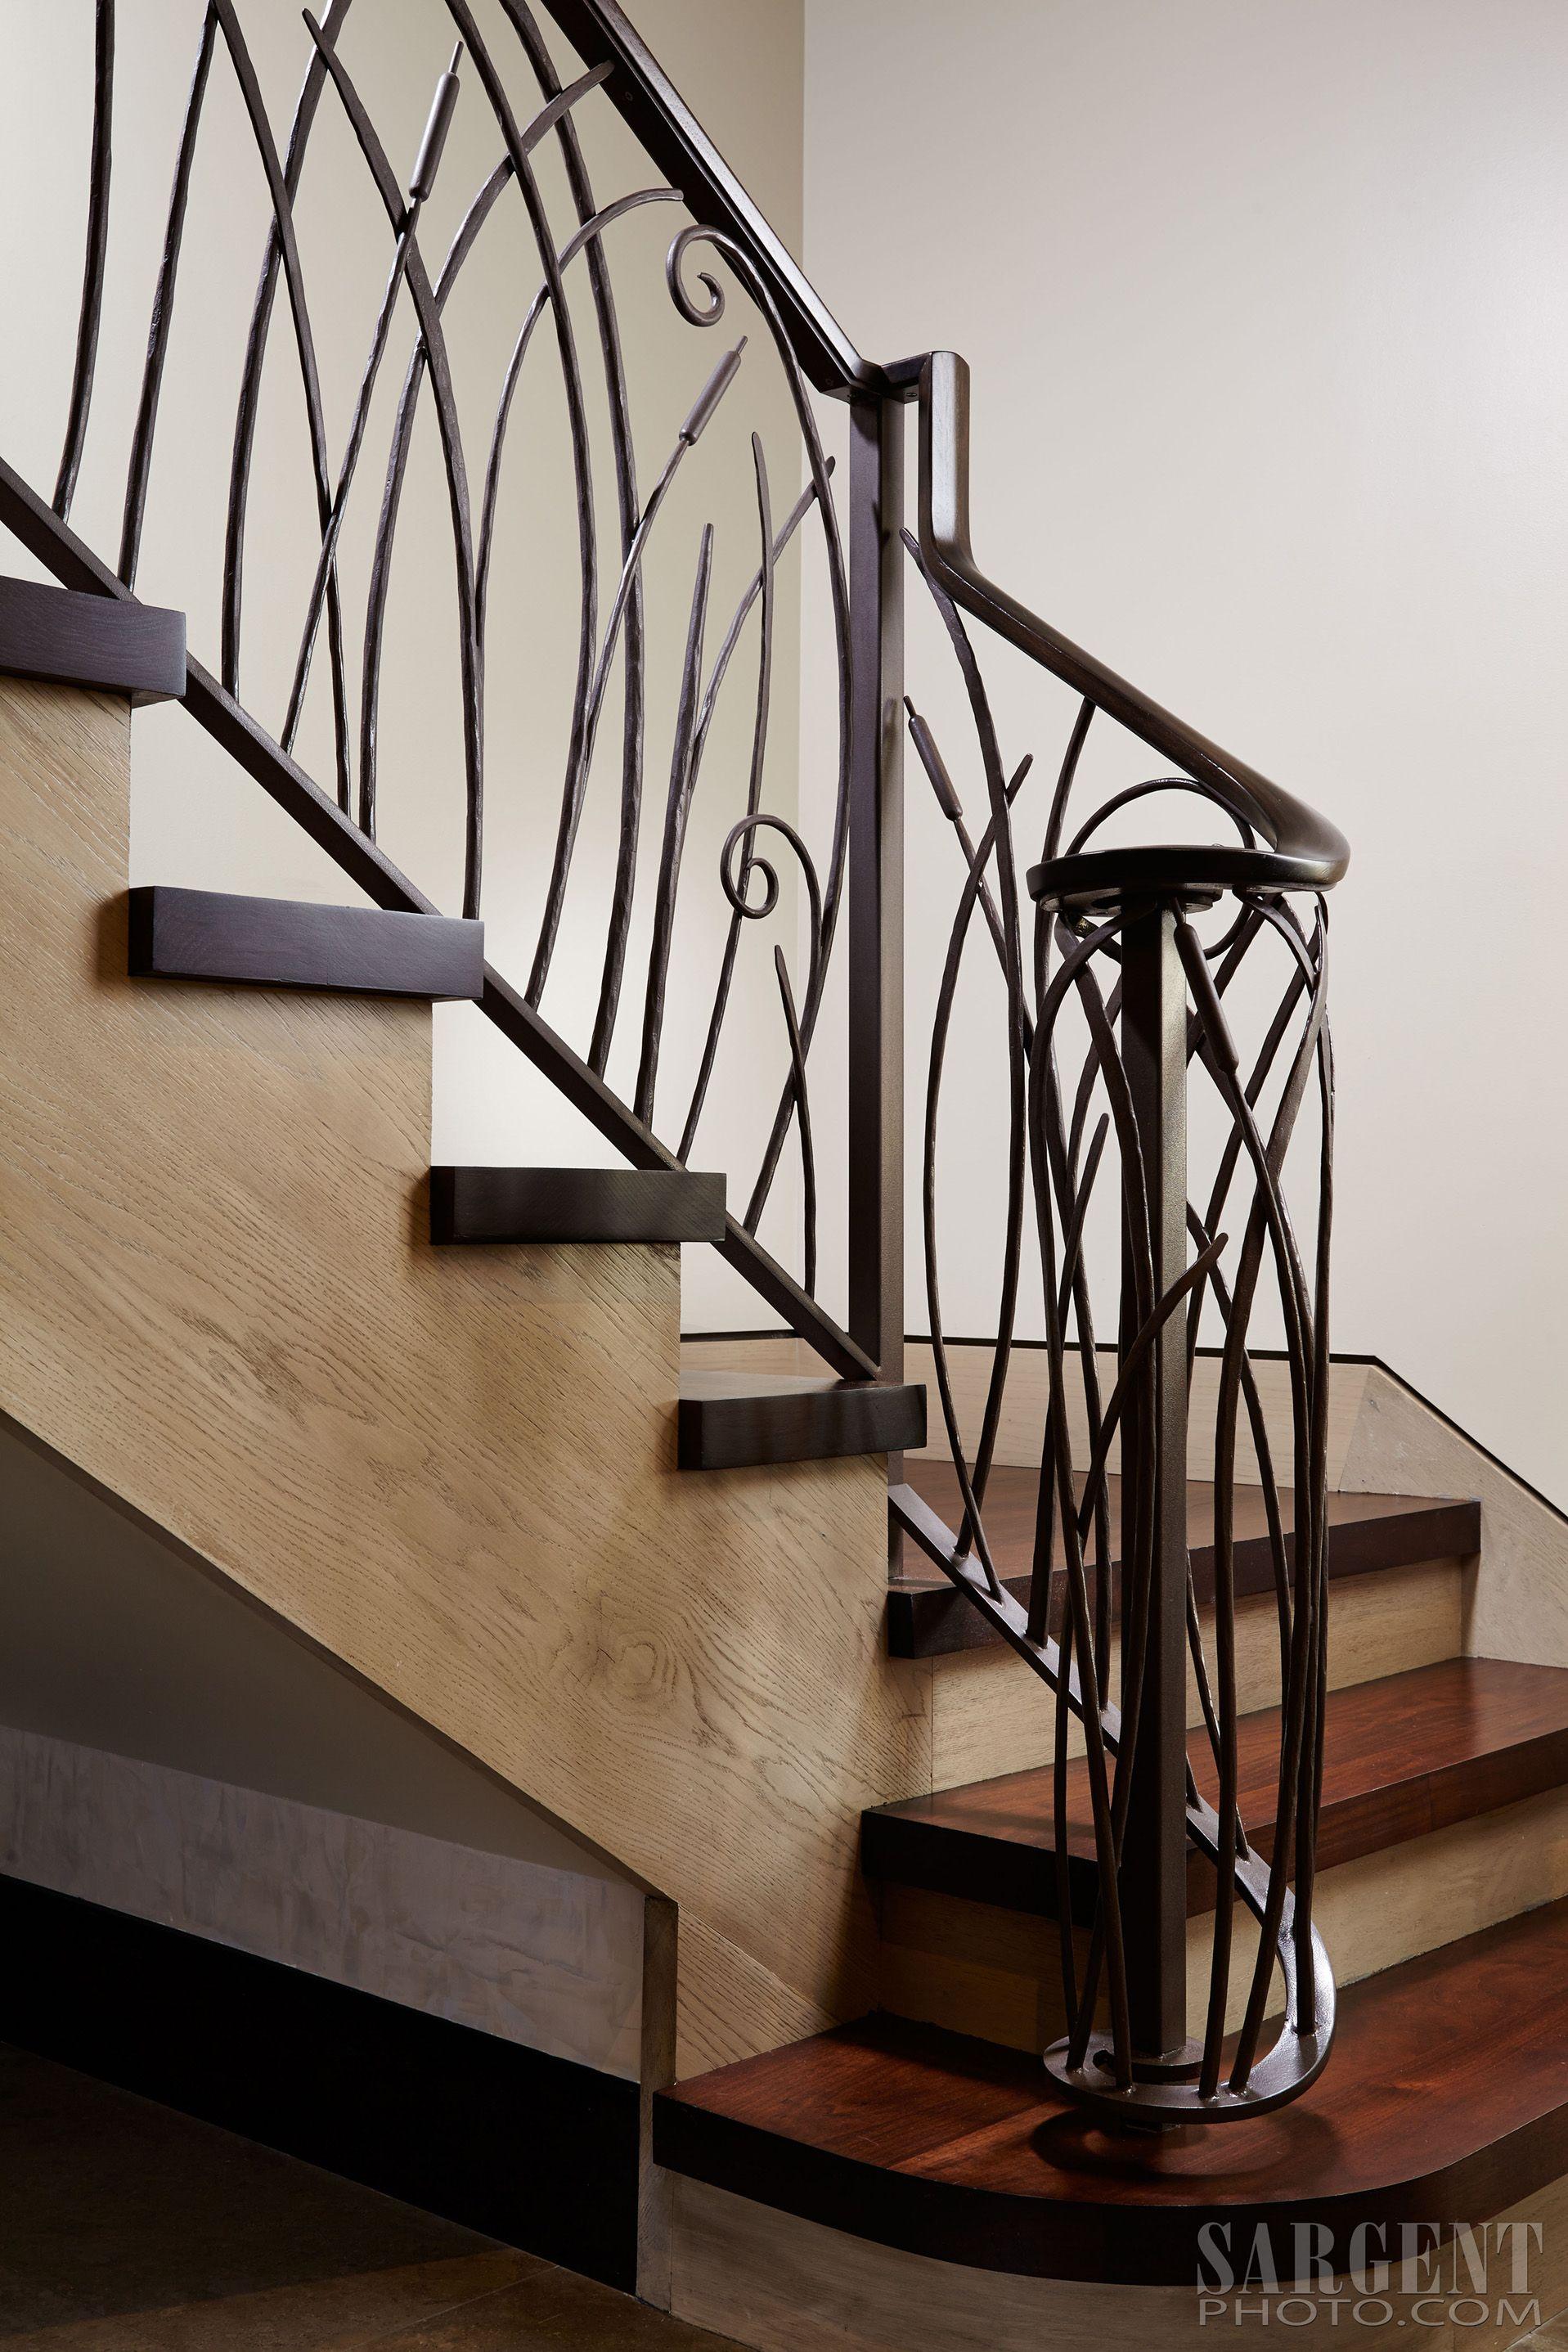 Best Custom Iron Stair Railing Contemporary Cat Tail Stair 400 x 300